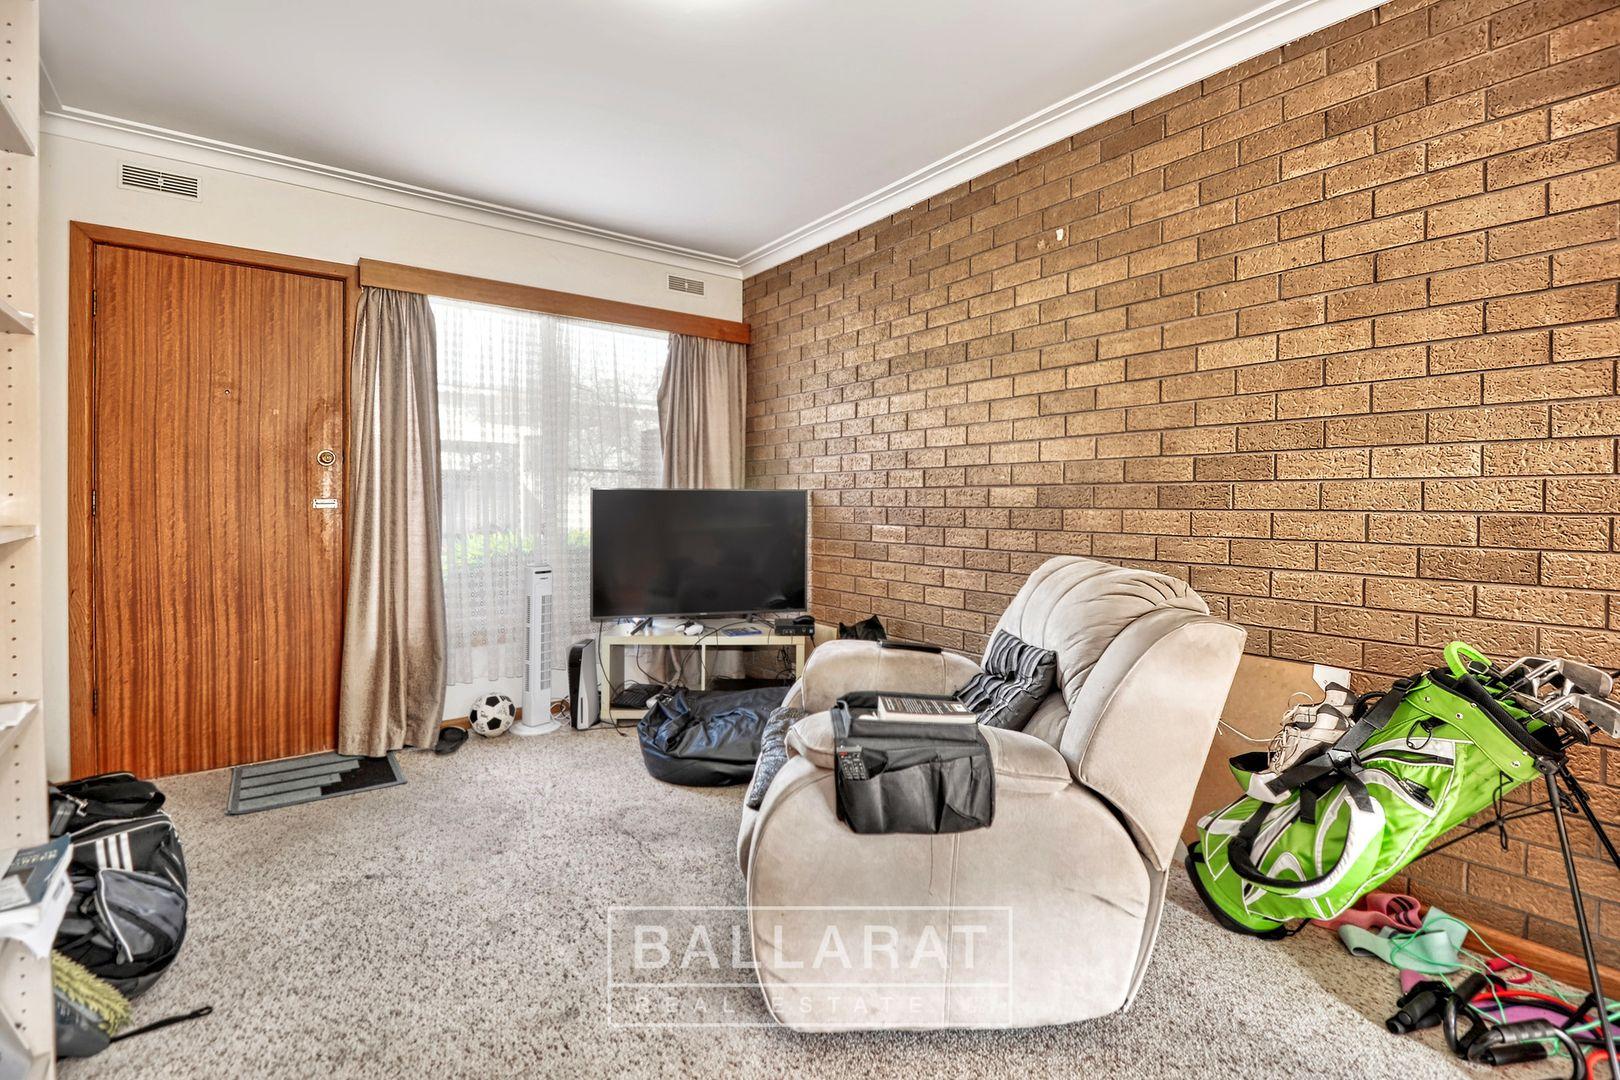 3/207 Doveton Street South, Ballarat Central VIC 3350, Image 2